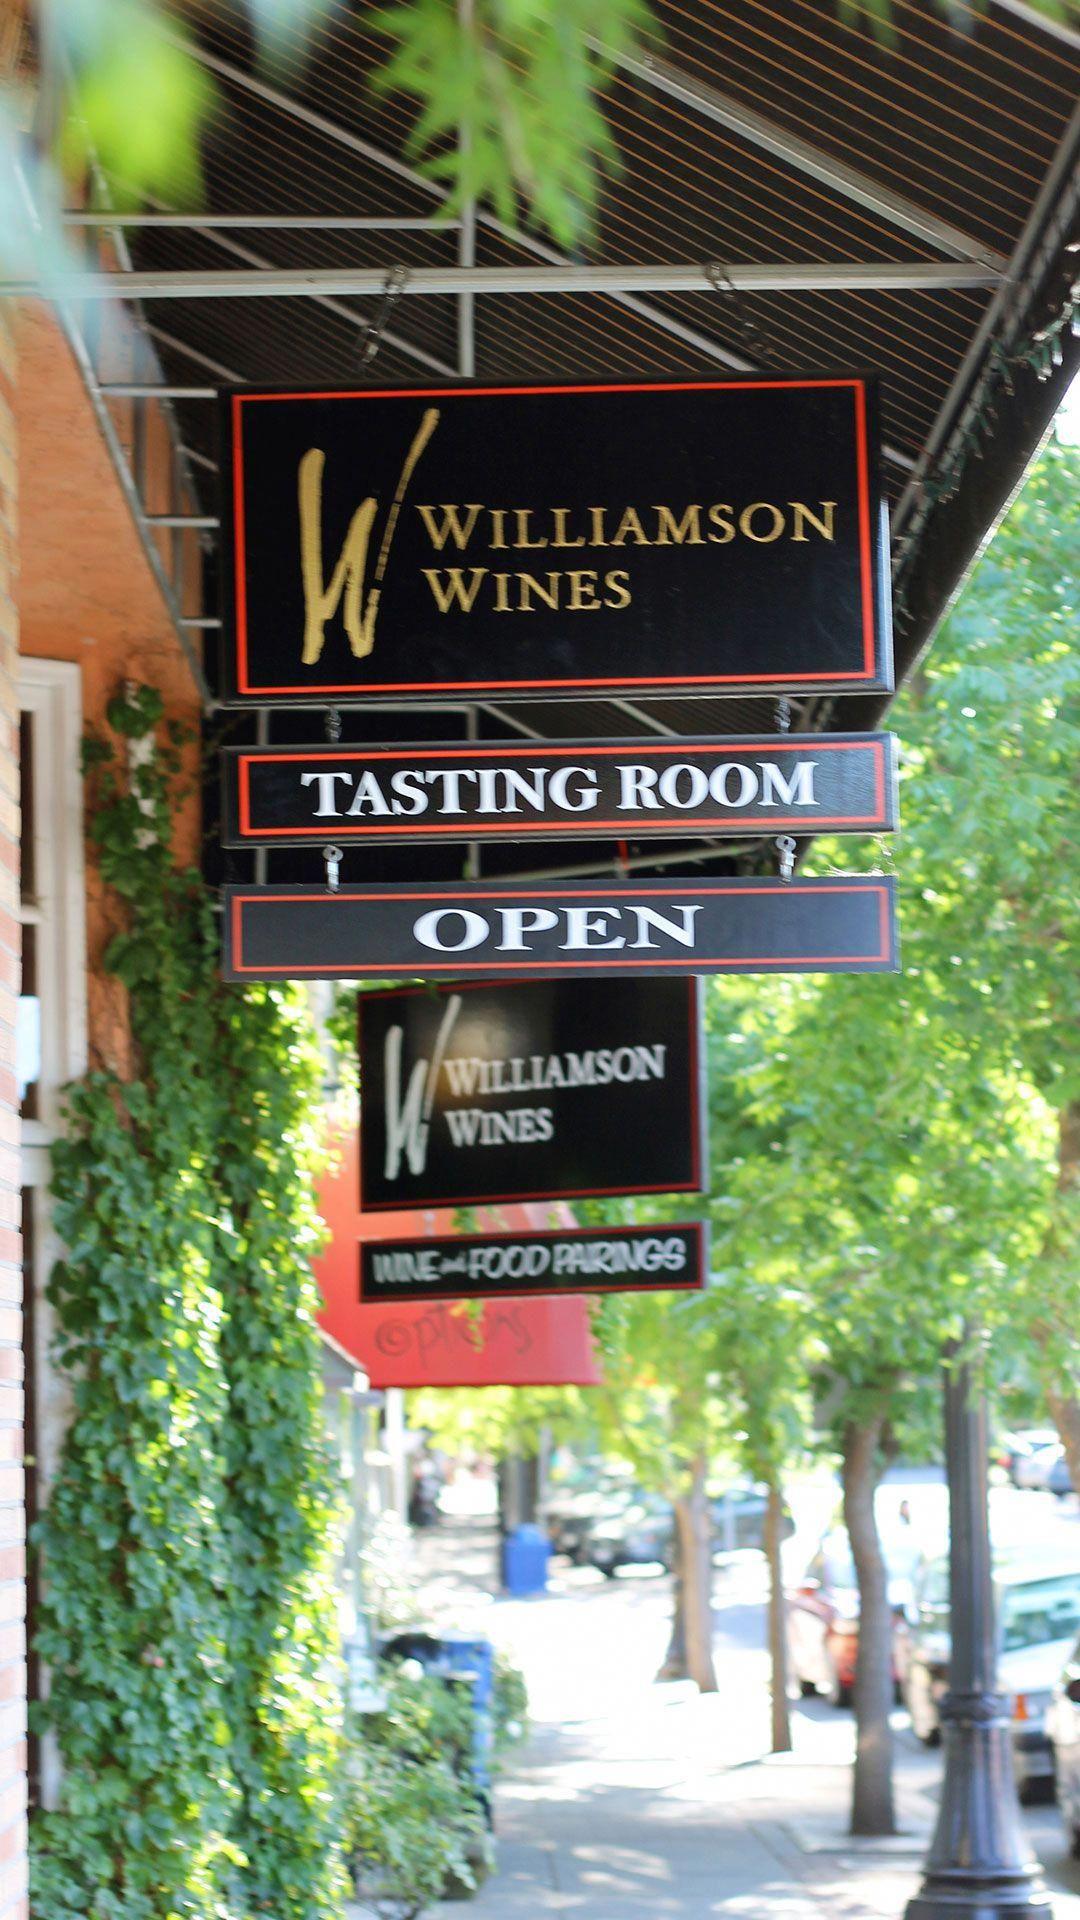 Wine Shipping Boxes Near Me Shippingwine Caseofwine Wine Tasting Room Wine Country California Healdsburg California Wineries